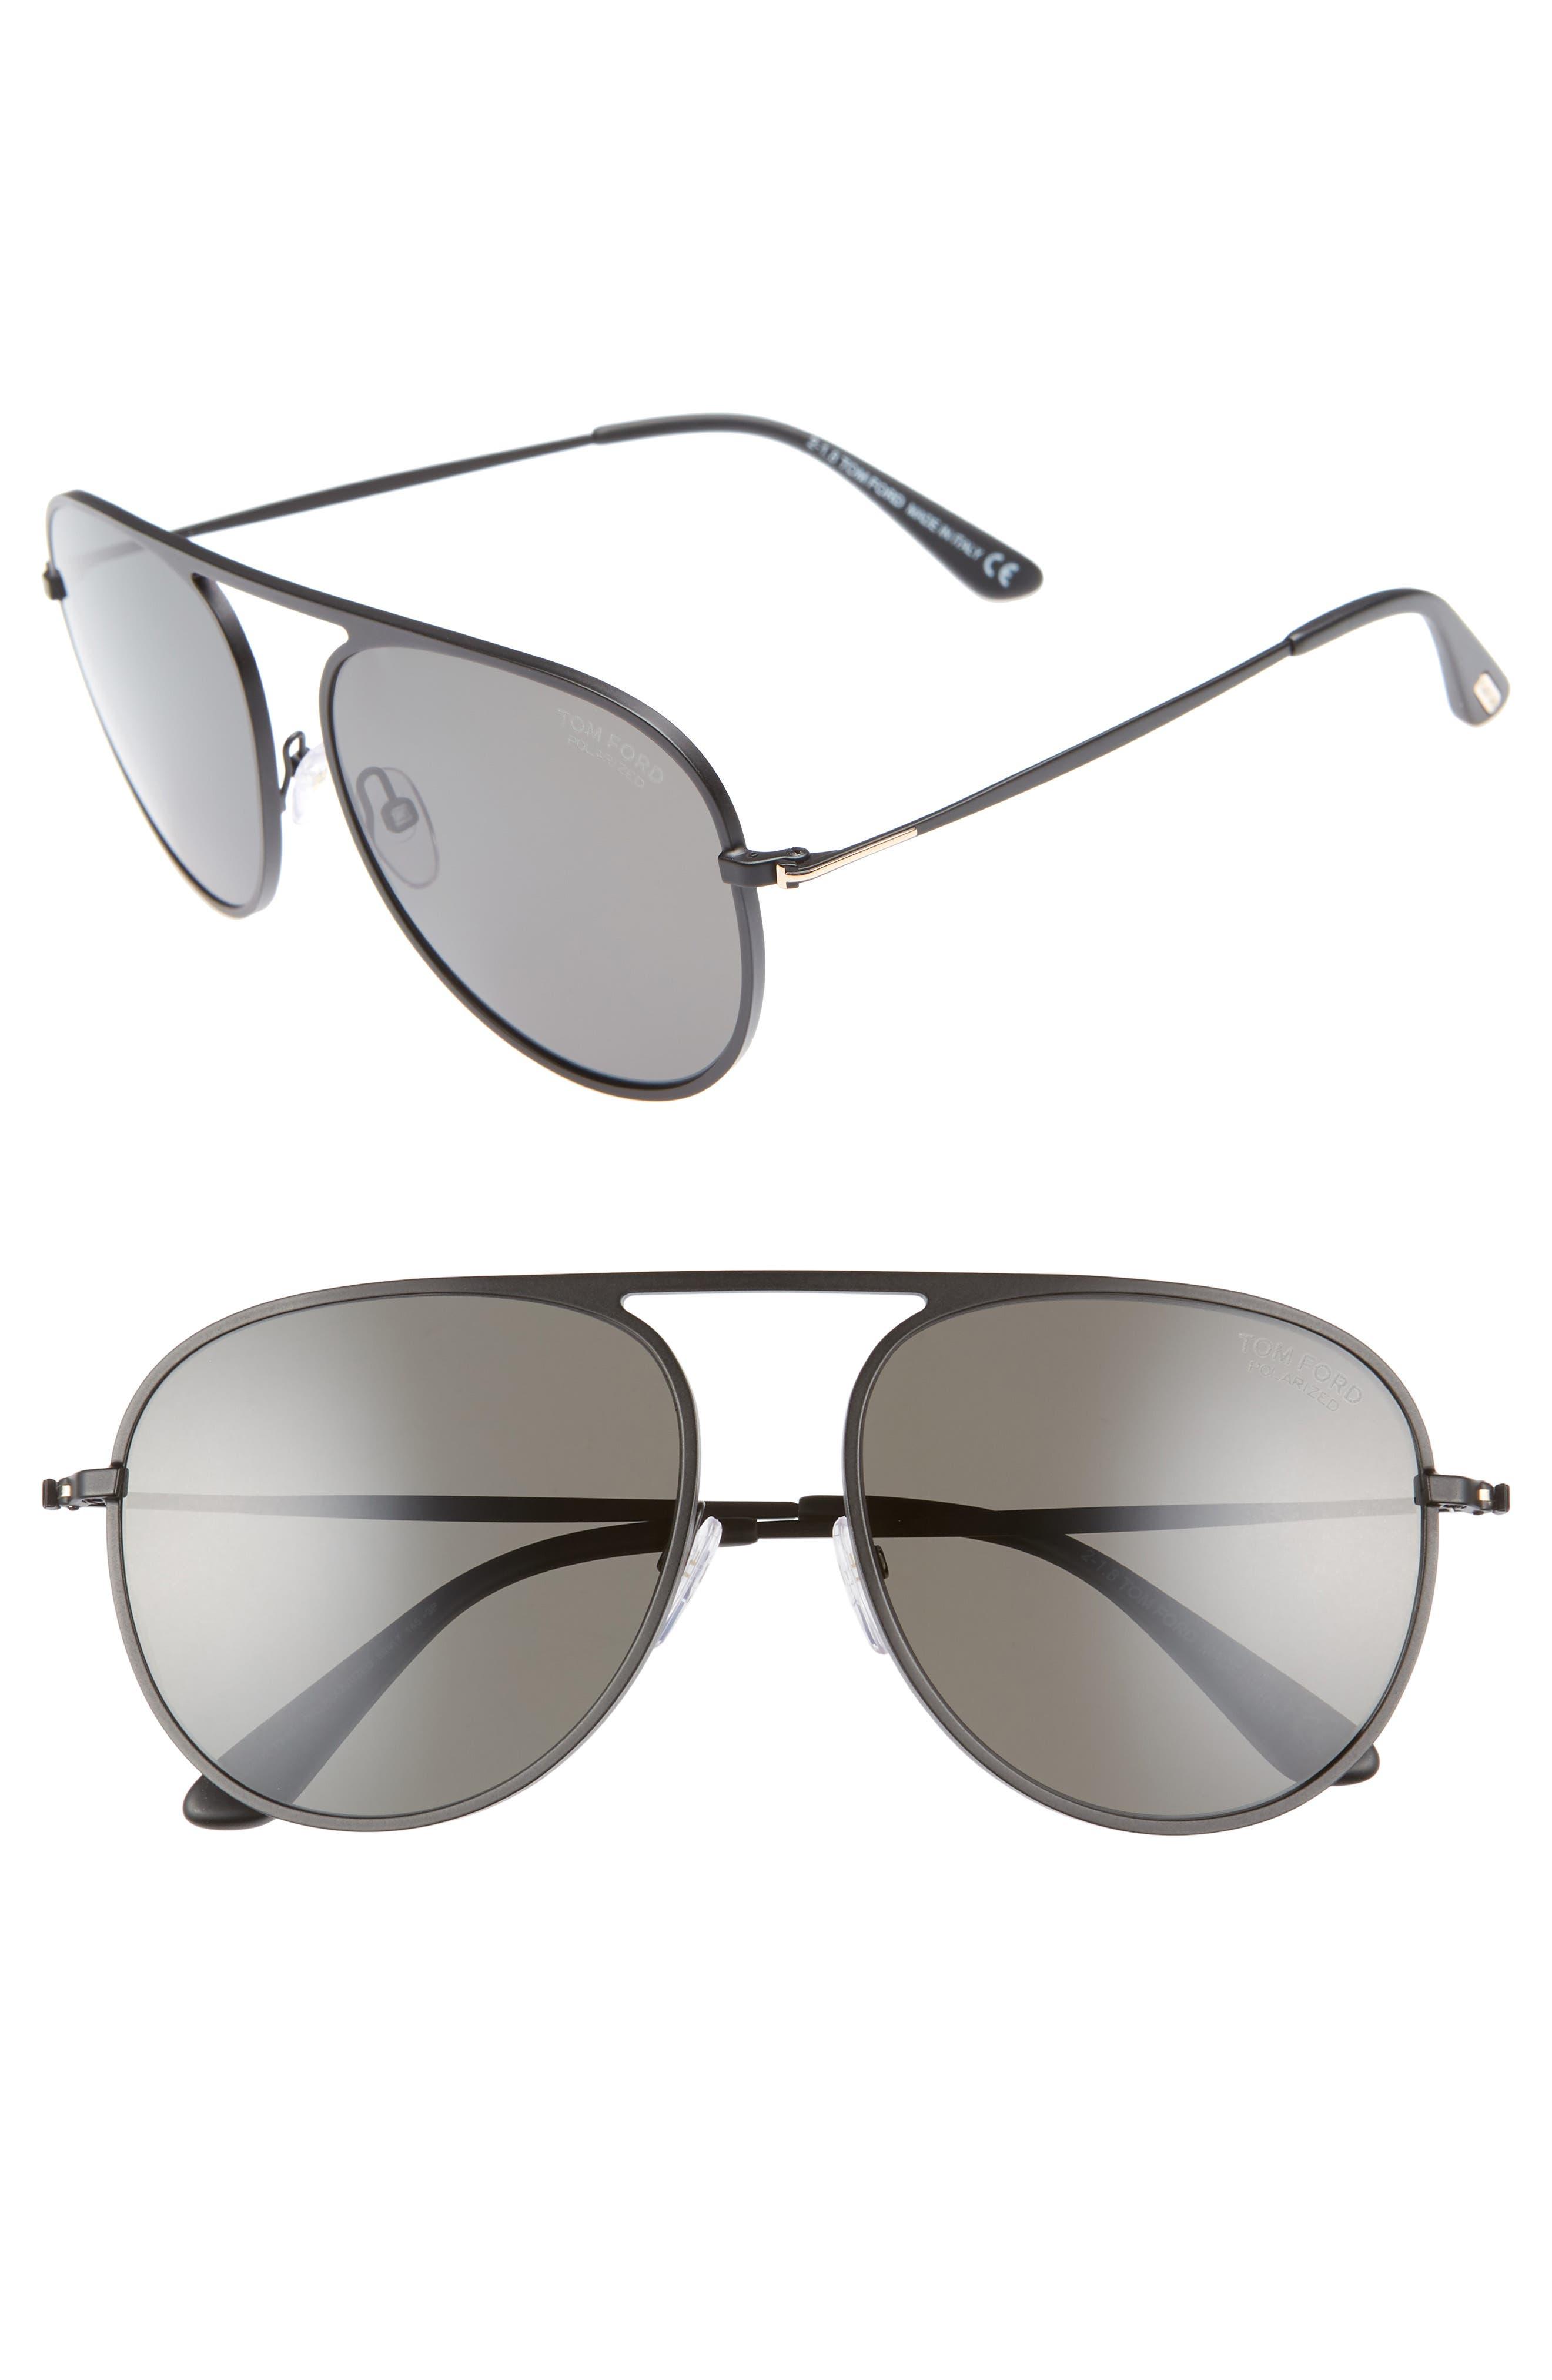 59mm Aviator Sunglasses,                         Main,                         color, BLACK MATTE FRAME/ BLACK